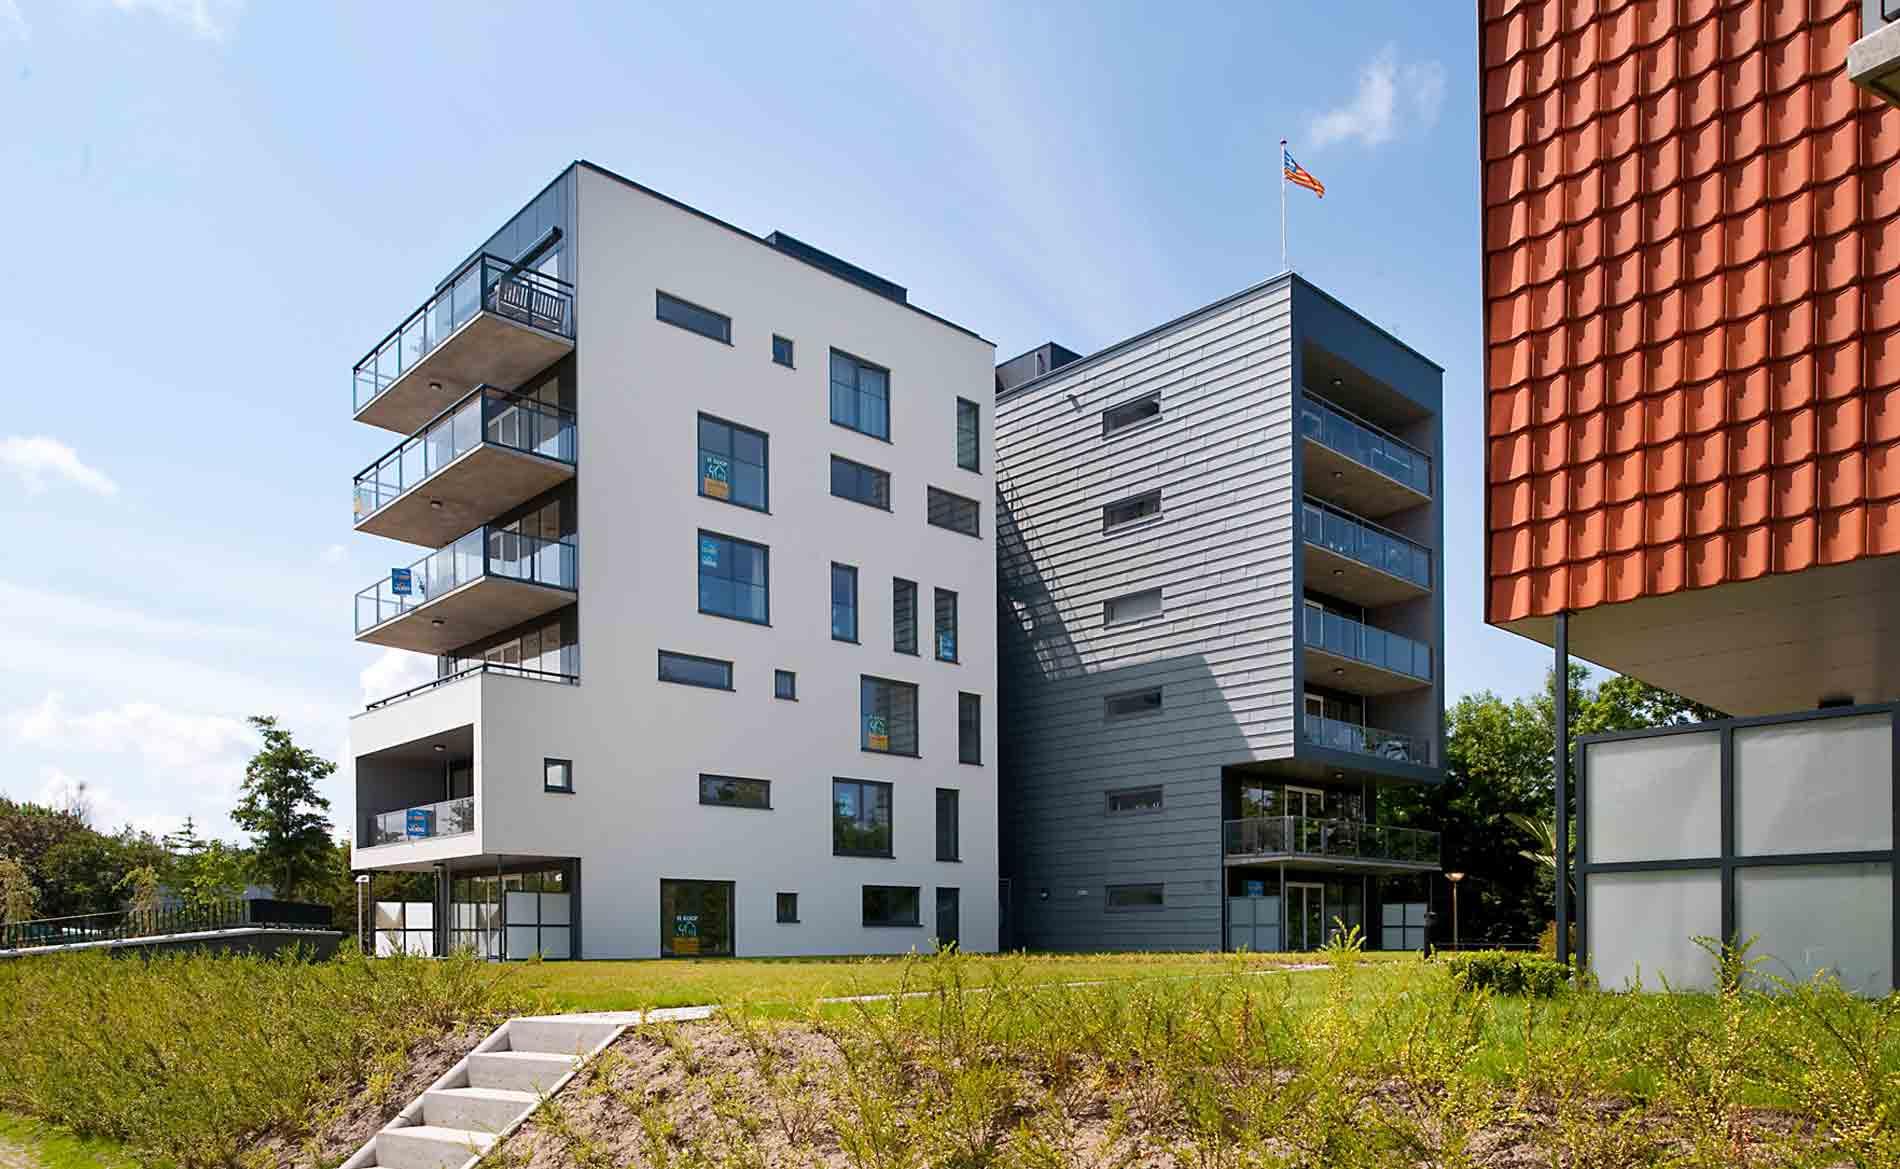 architect appartementen appartementengebouw hoogbouw woningbouw herstructurering Triade Castricum BBHD architecten